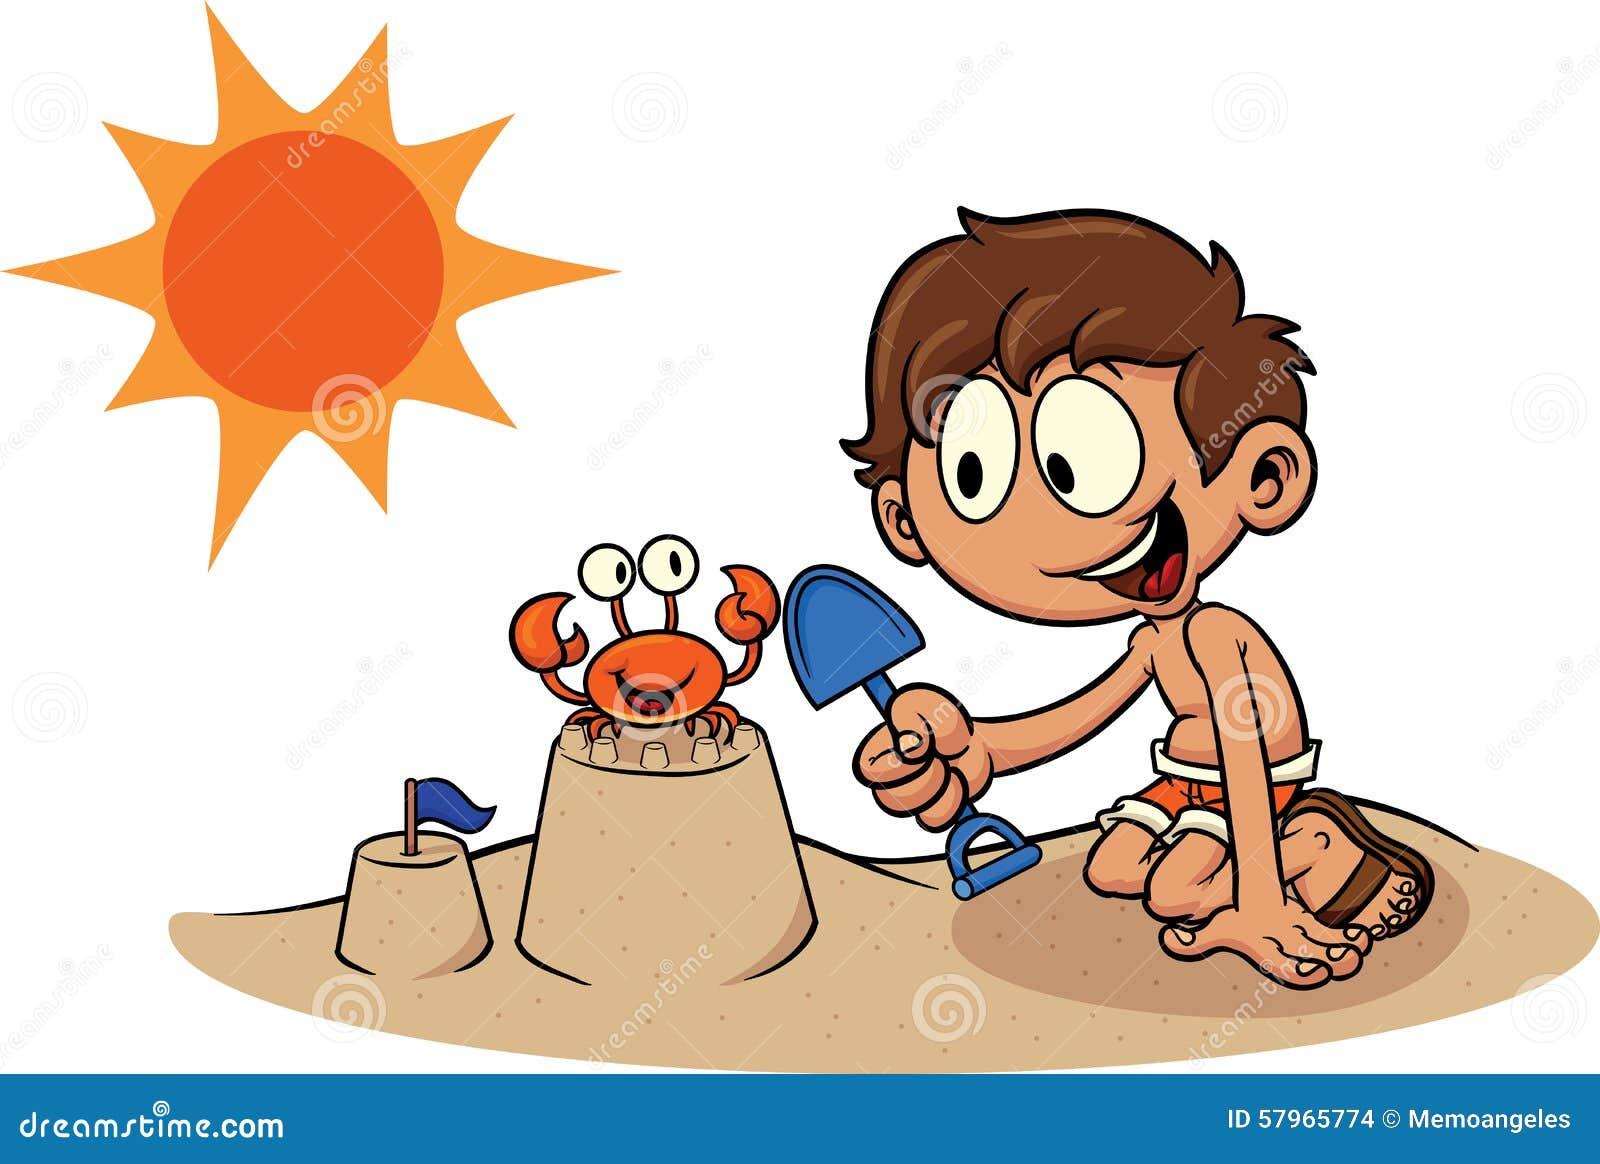 kid building a sand castle stock vector illustration of cute 57965774 rh dreamstime com dreamstime clipart Rabbit Clip Art Dreamstime